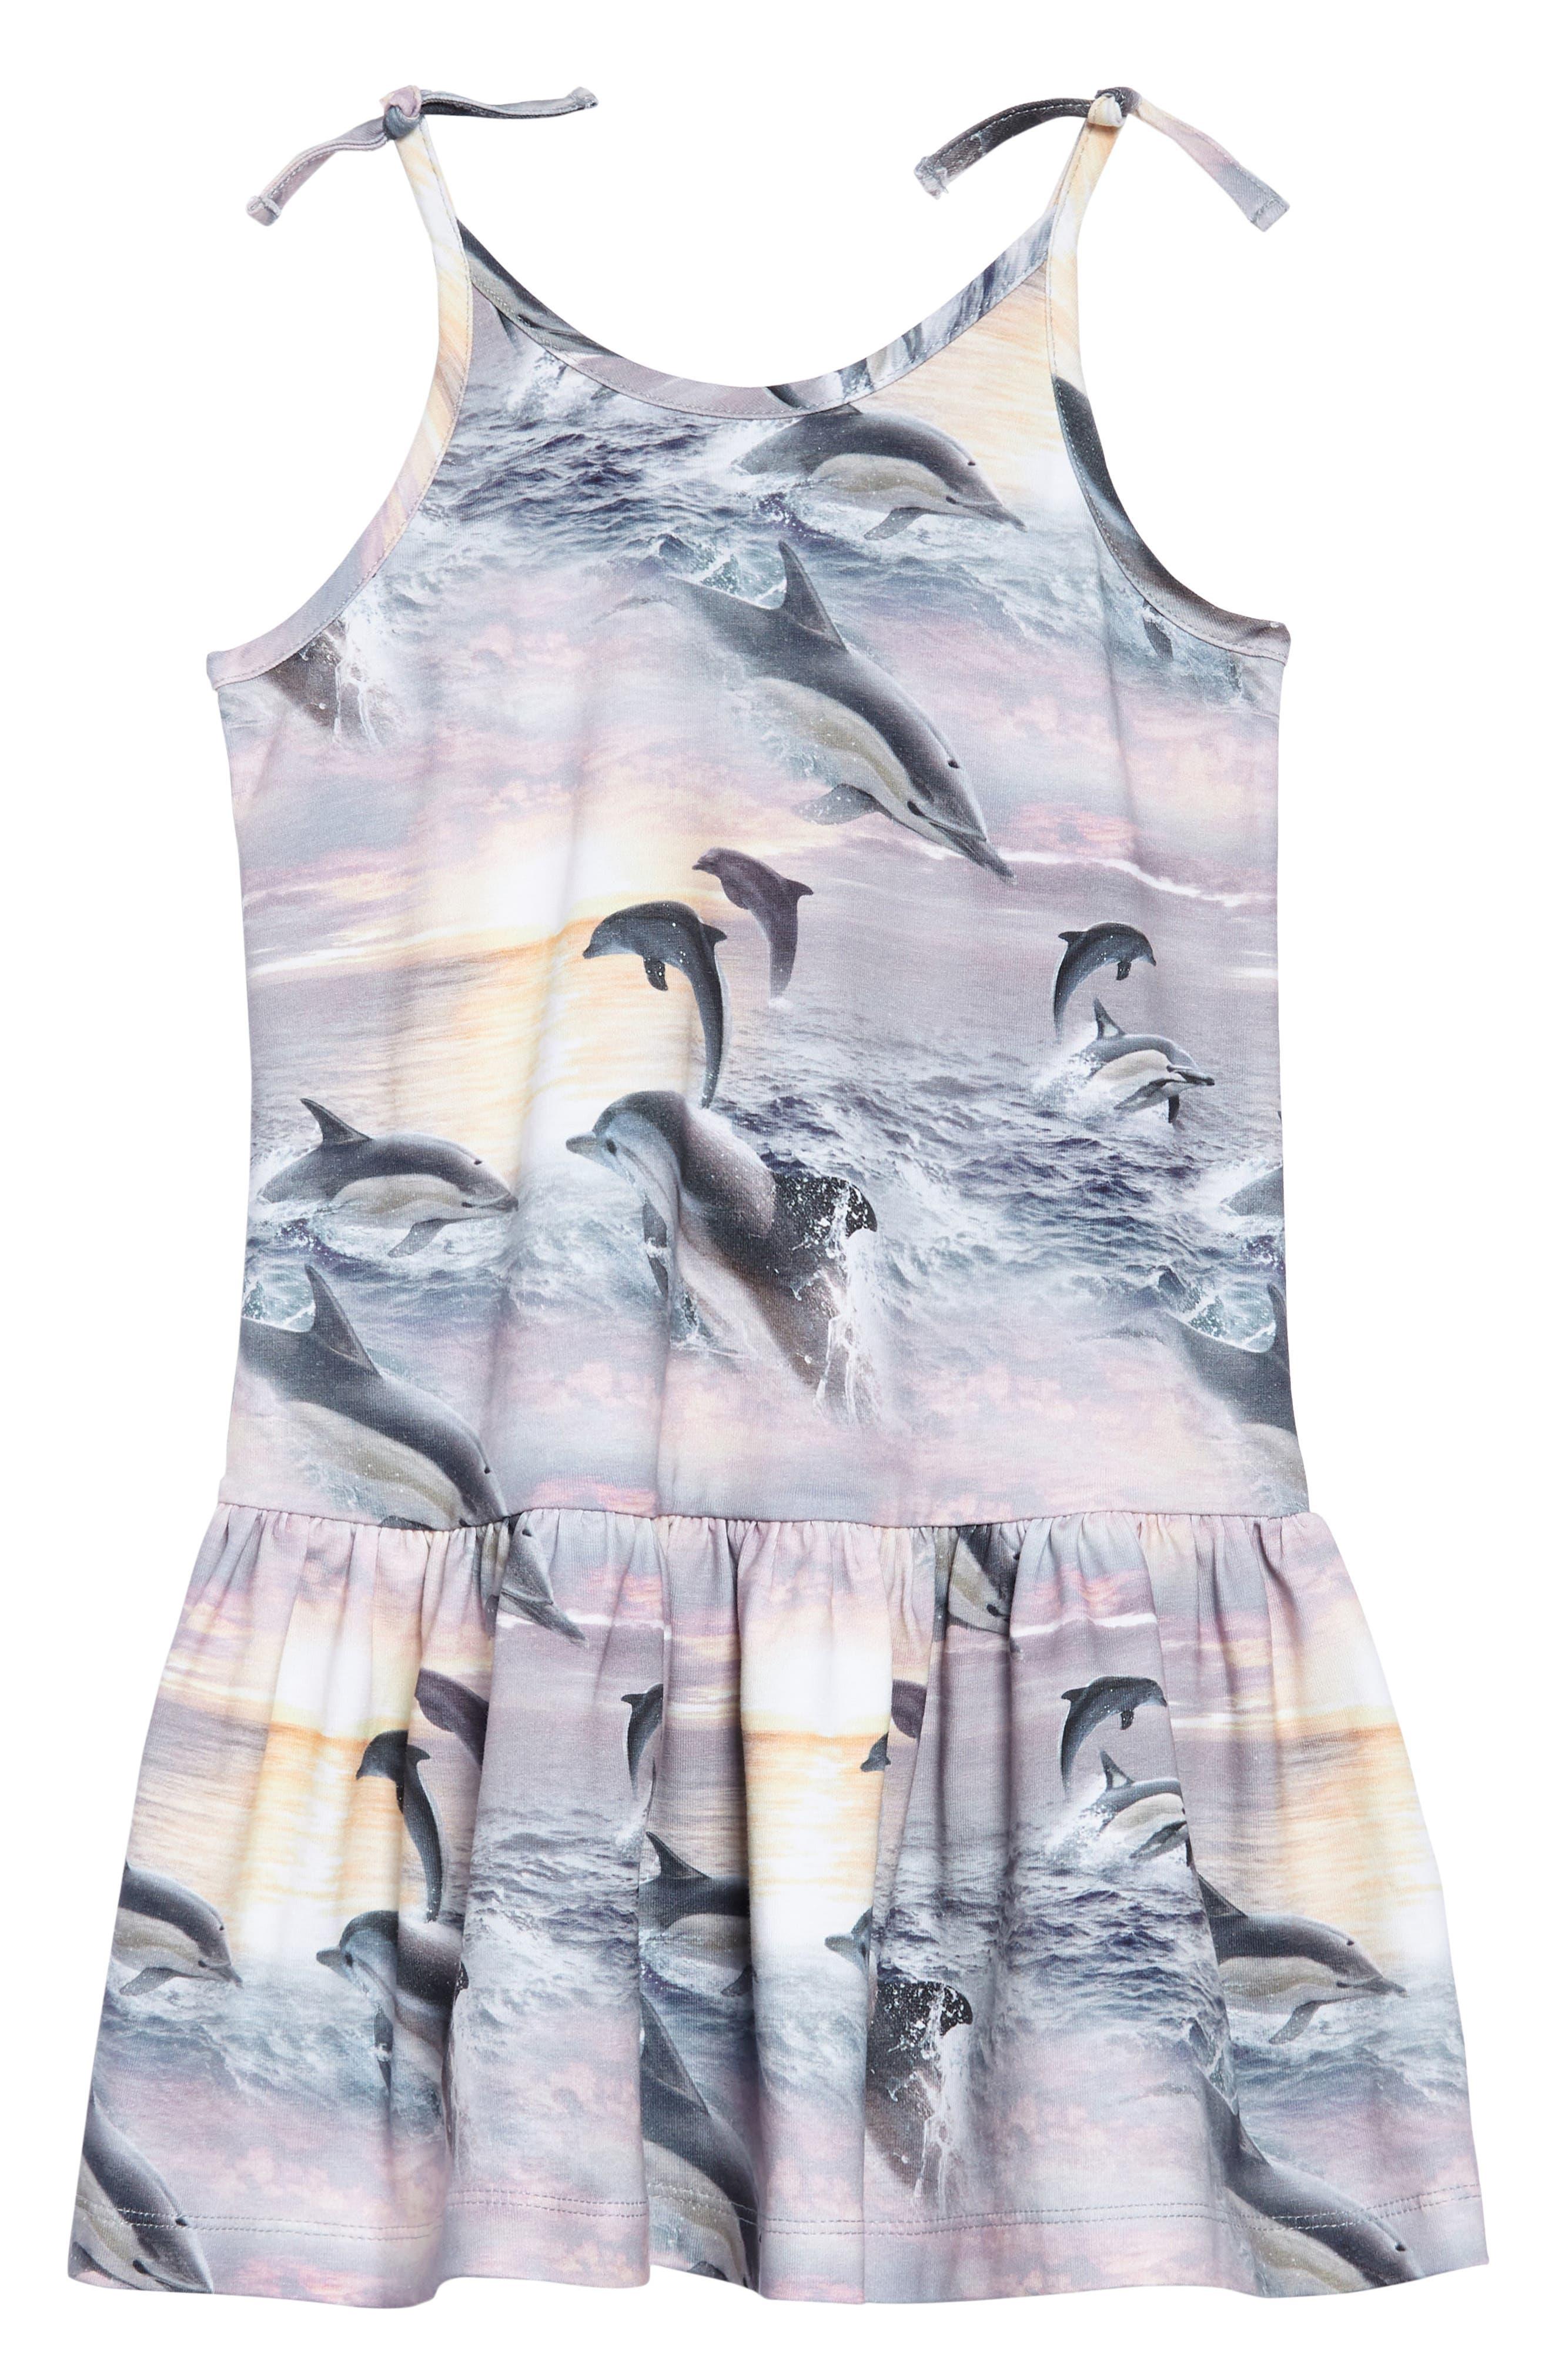 Camilla Dolphin Dress,                             Main thumbnail 1, color,                             DOLPHIN SUNSET